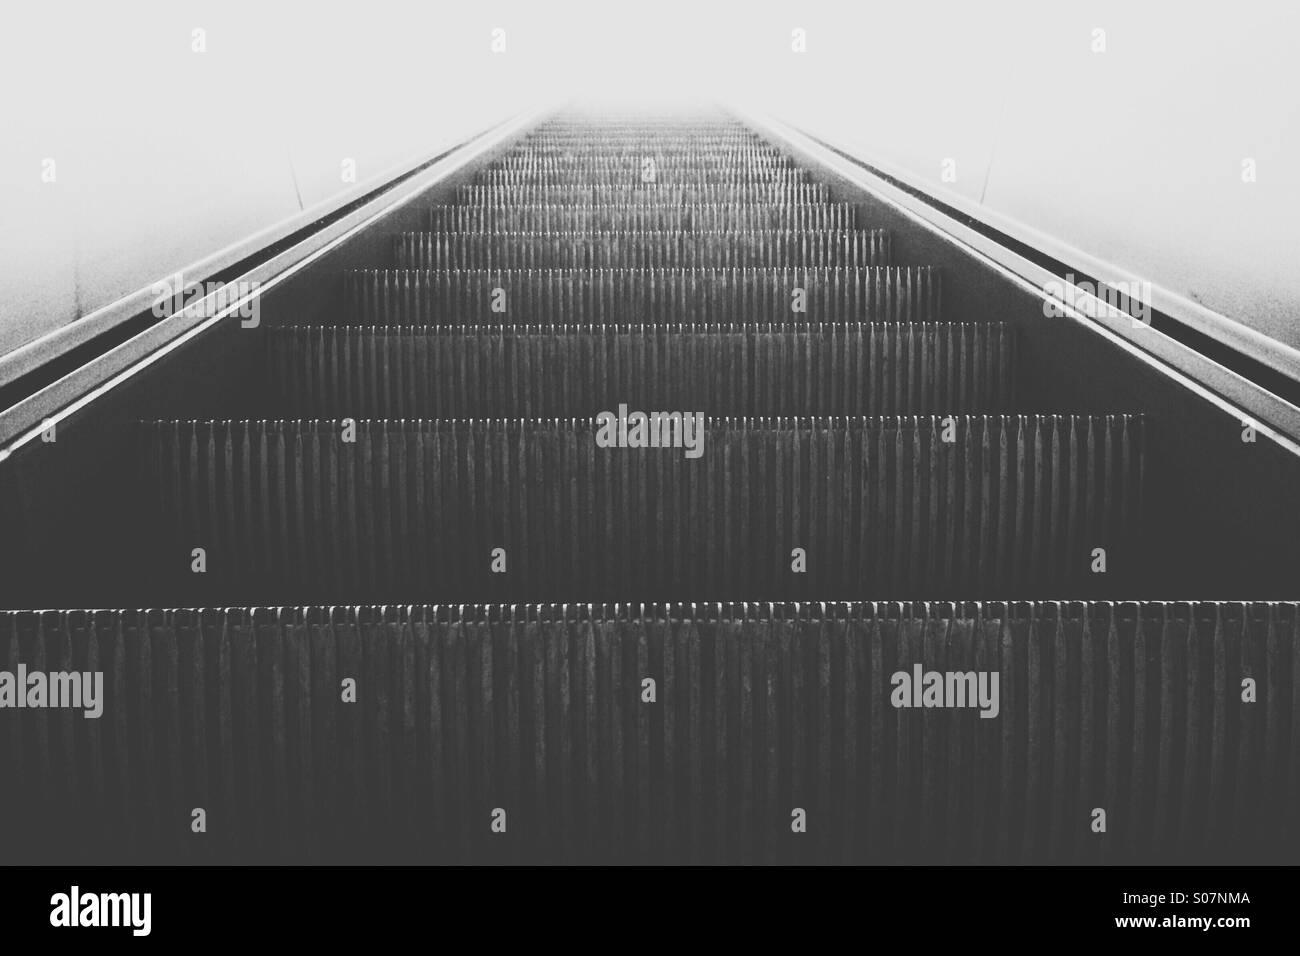 escalators moving upwards into light - Stock Image